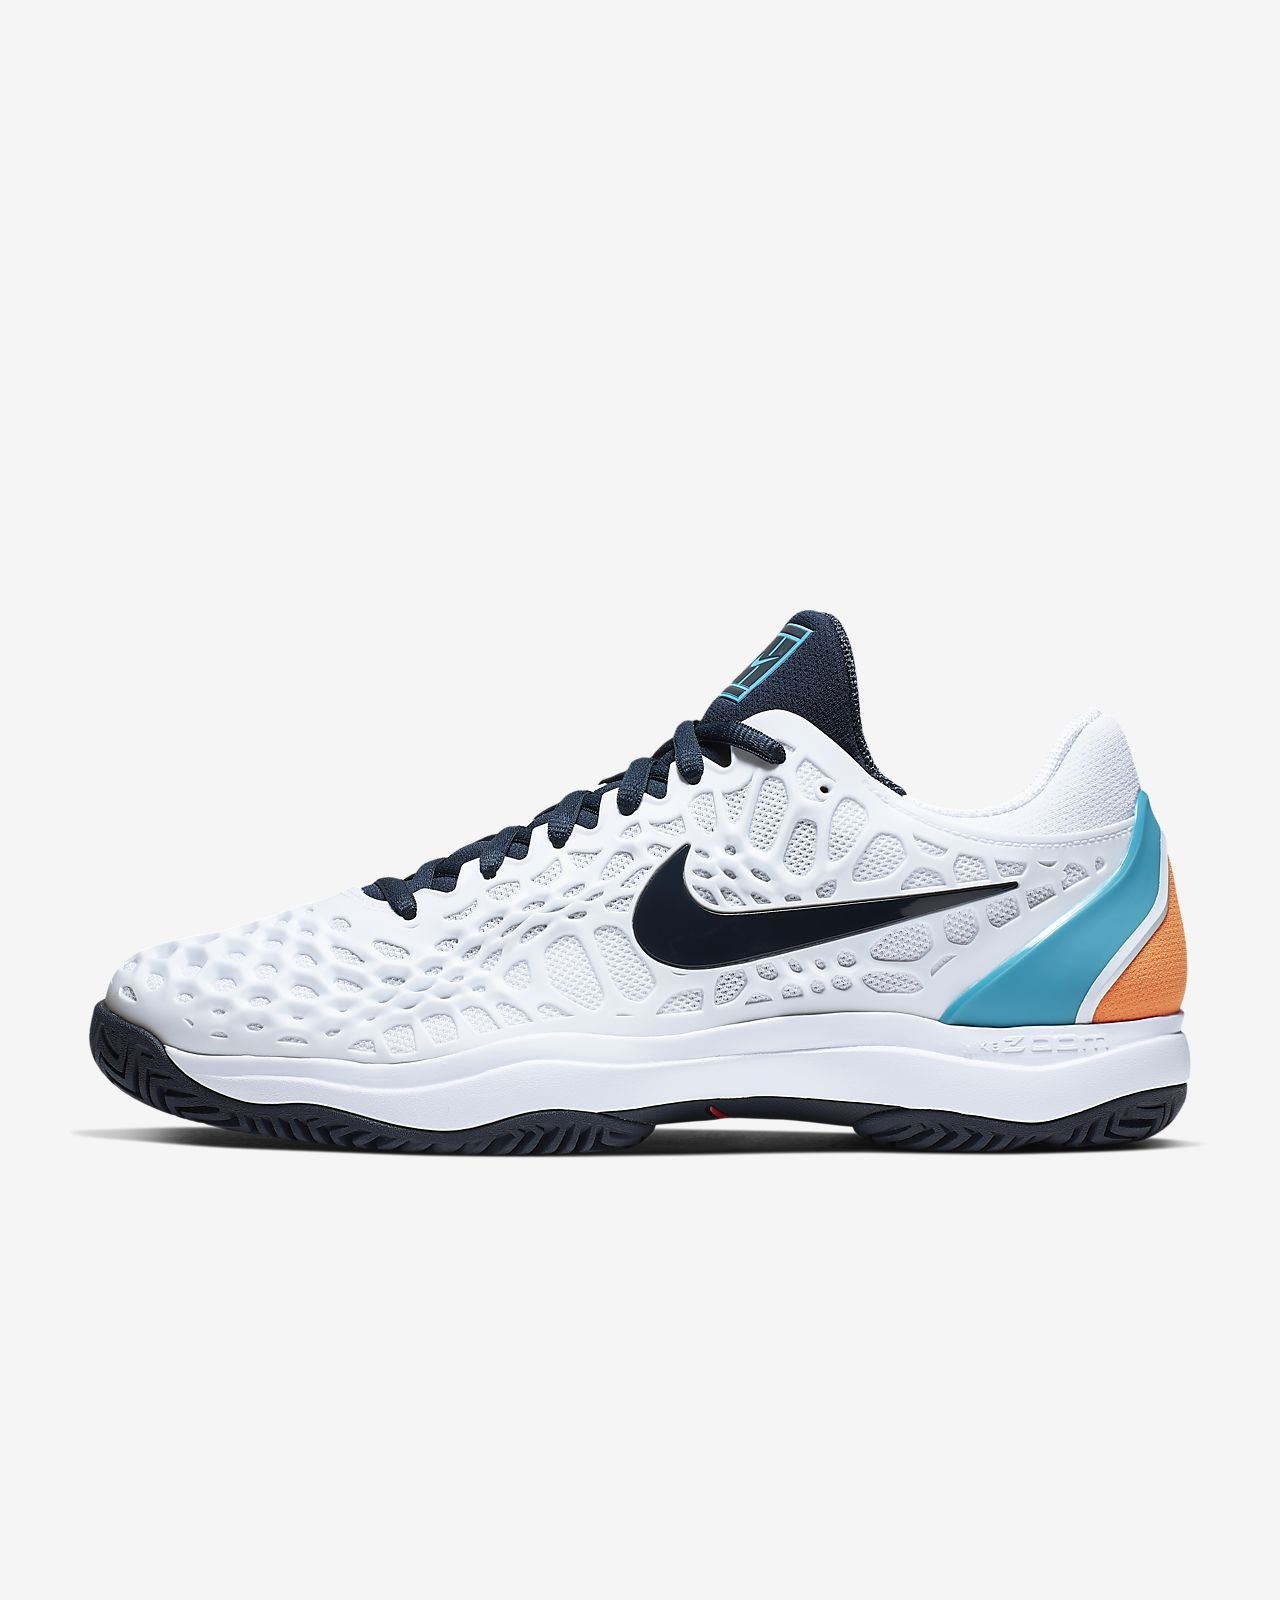 Calzado de tenis en cancha dura para hombre NikeCourt Zoom Cage 3